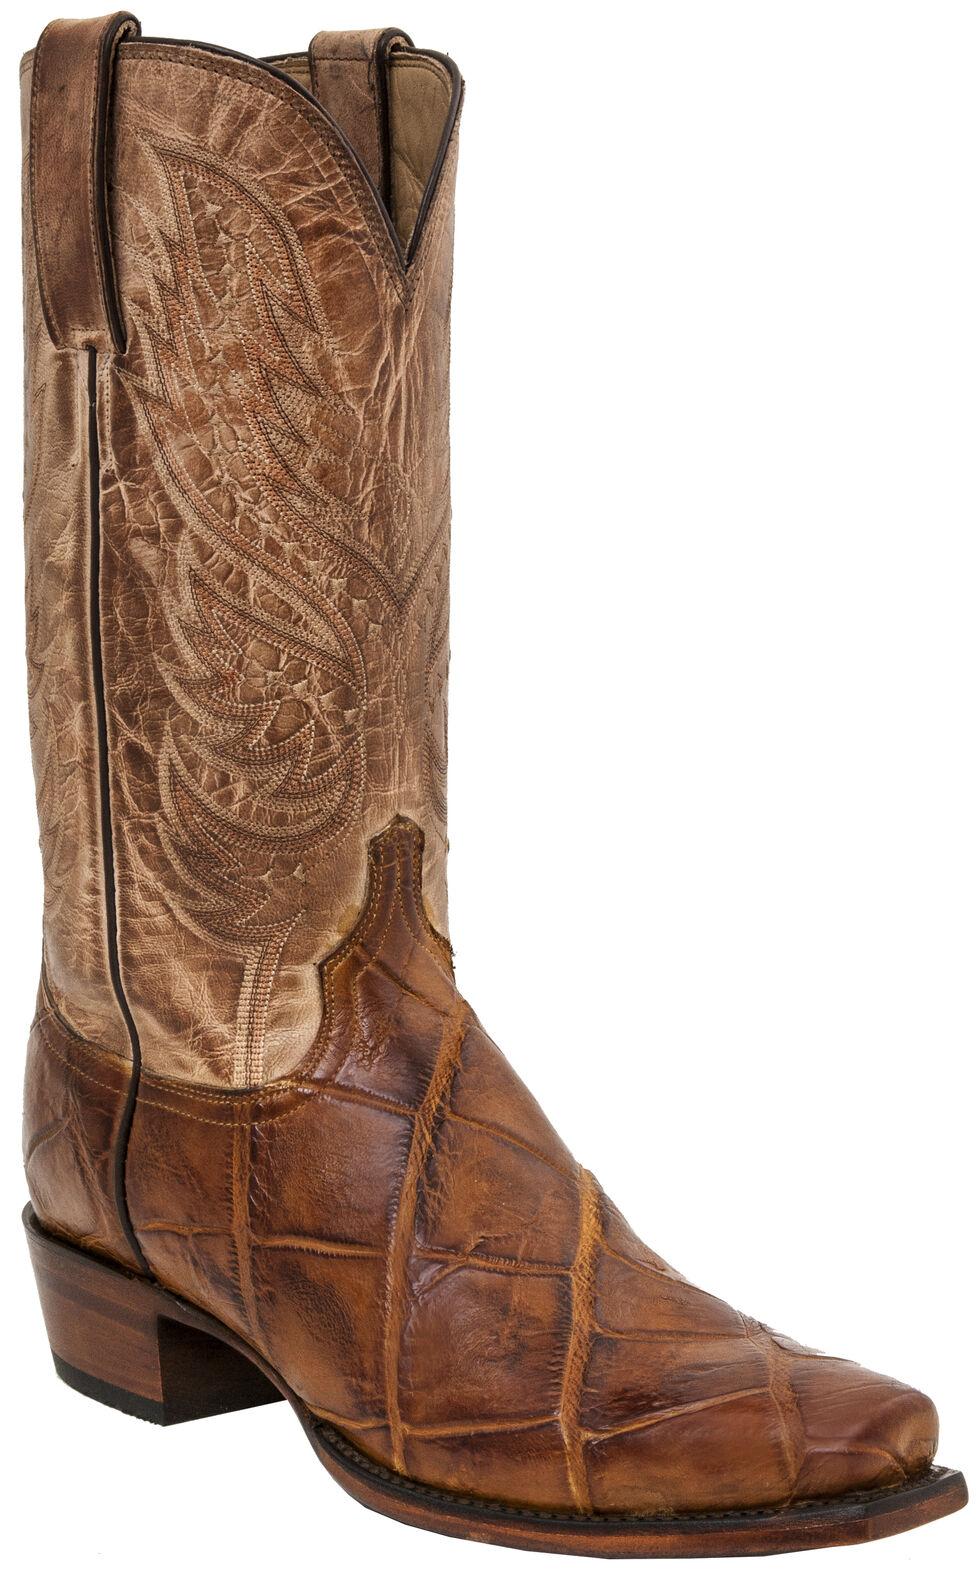 Lucchese Men's Handmade Rex Alligator Western Boots - Square Toe, Brandy, hi-res